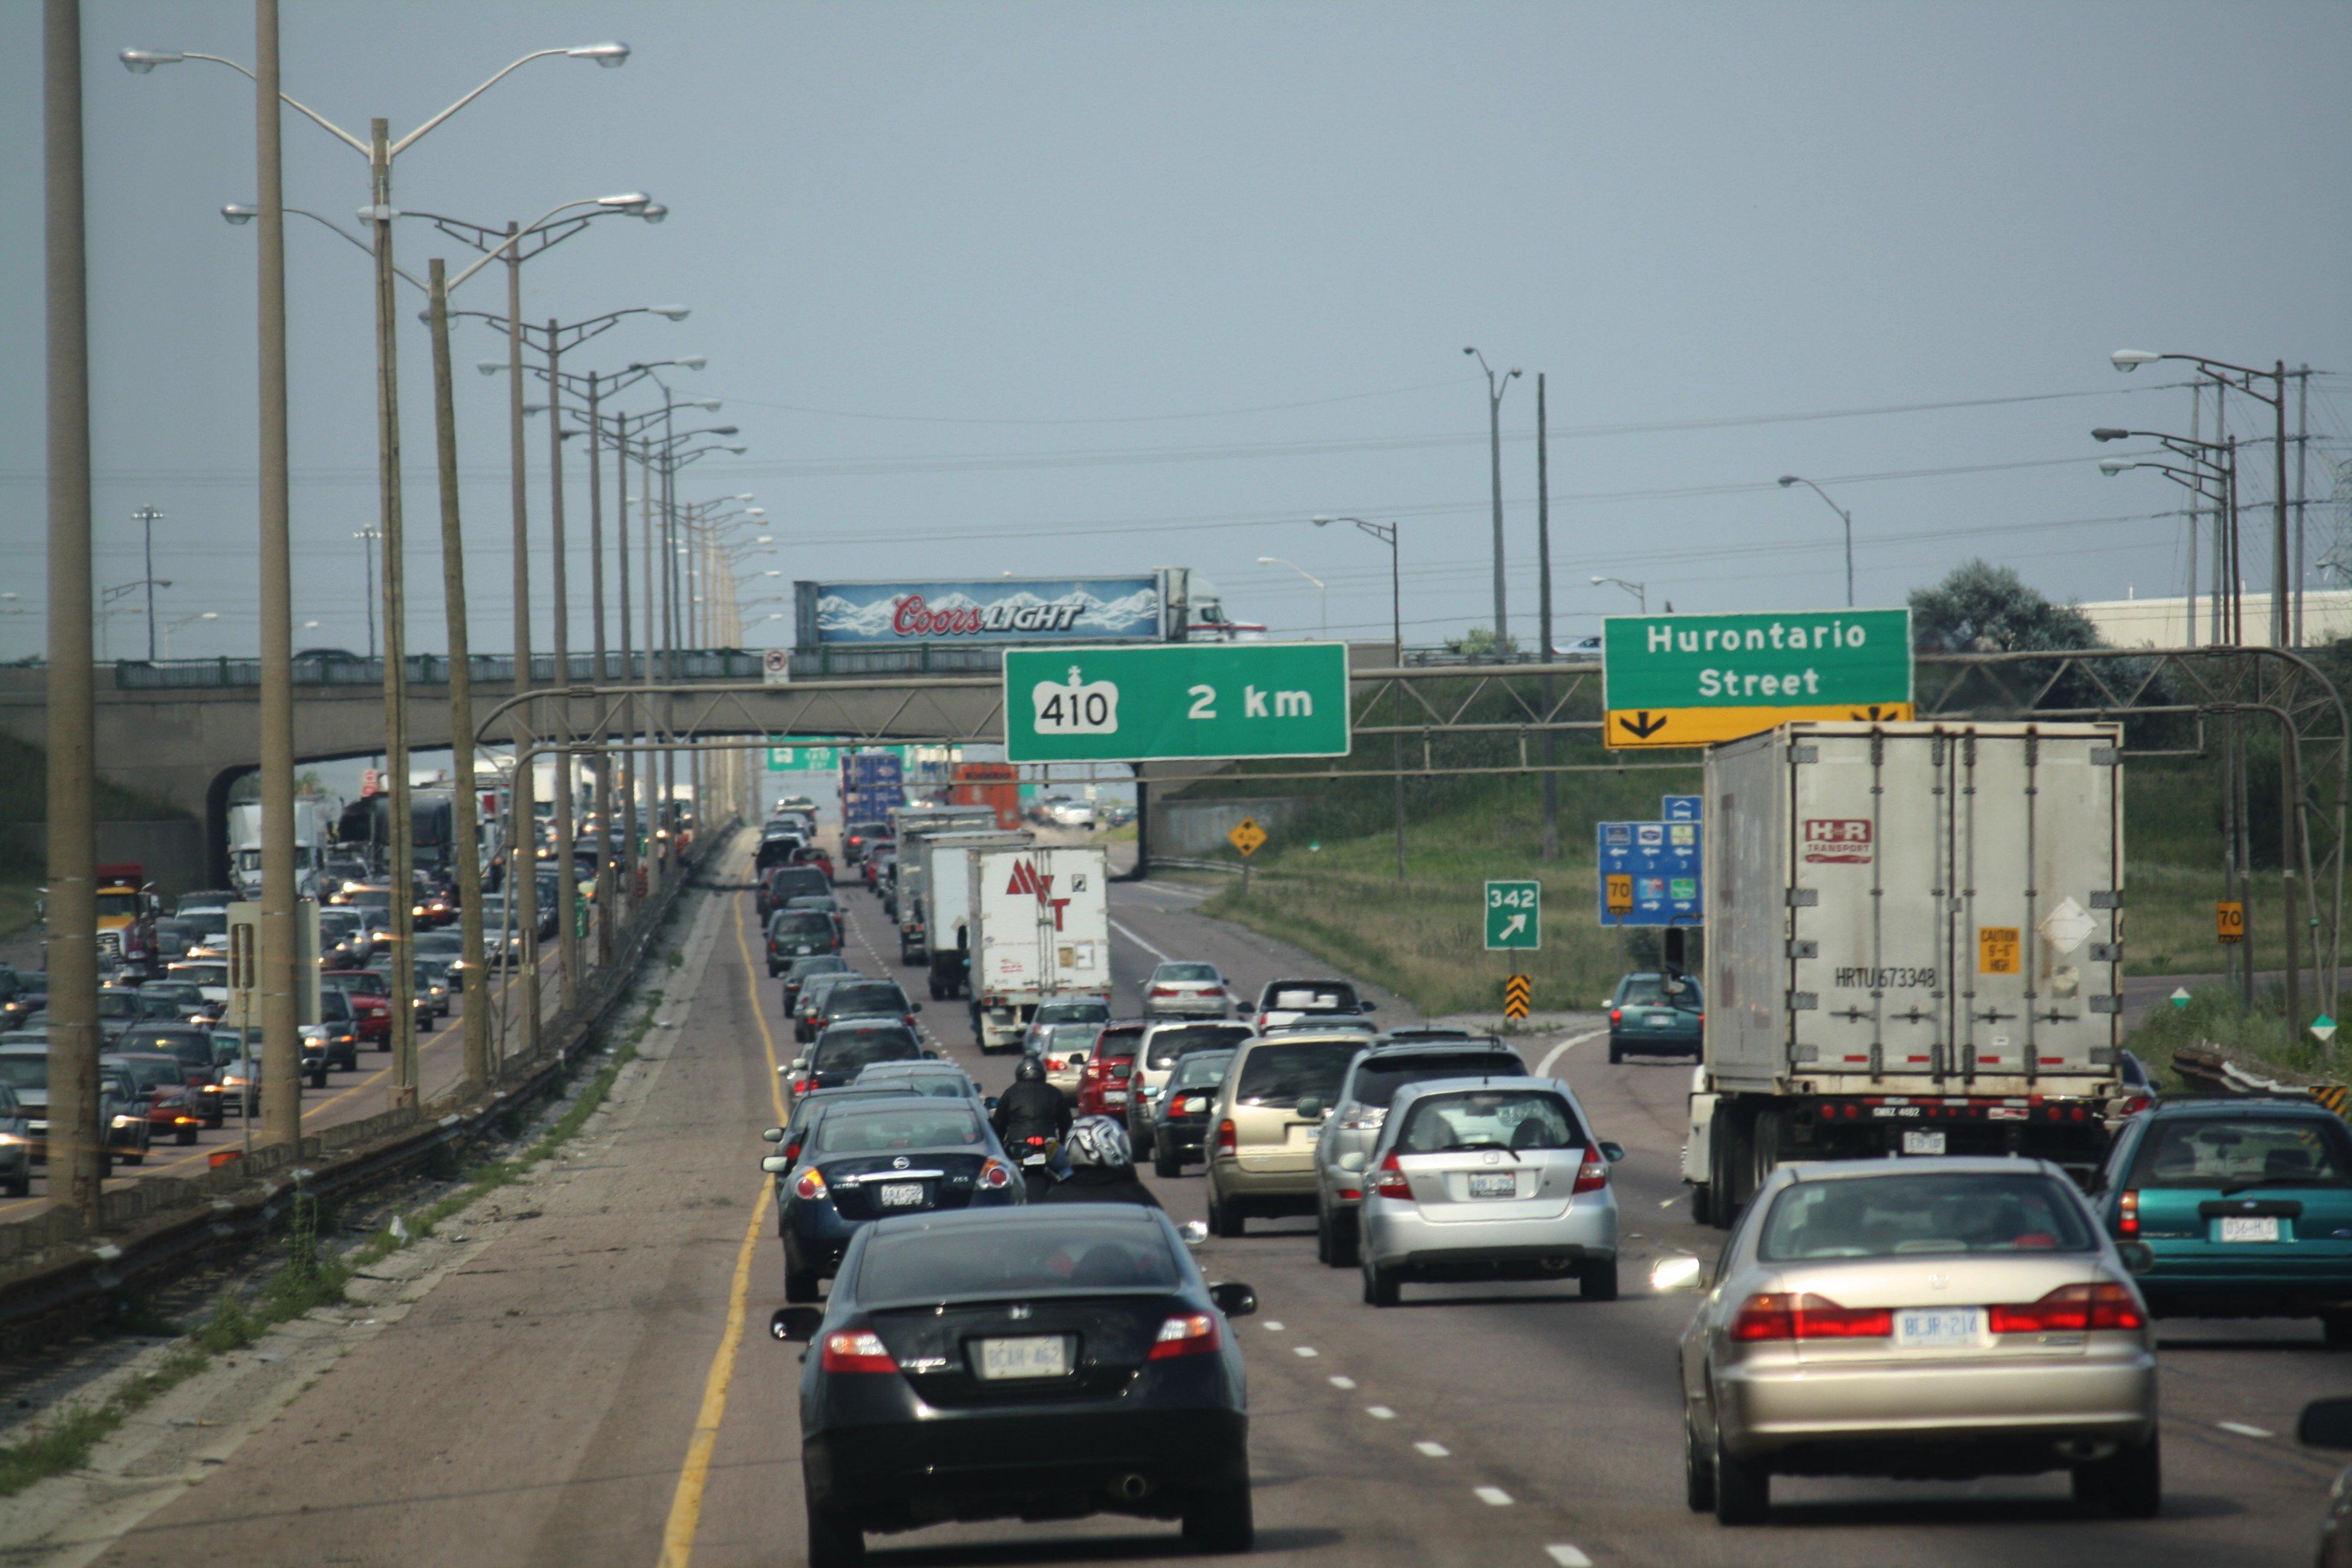 Exzess Hurontario Toronto Escort 401